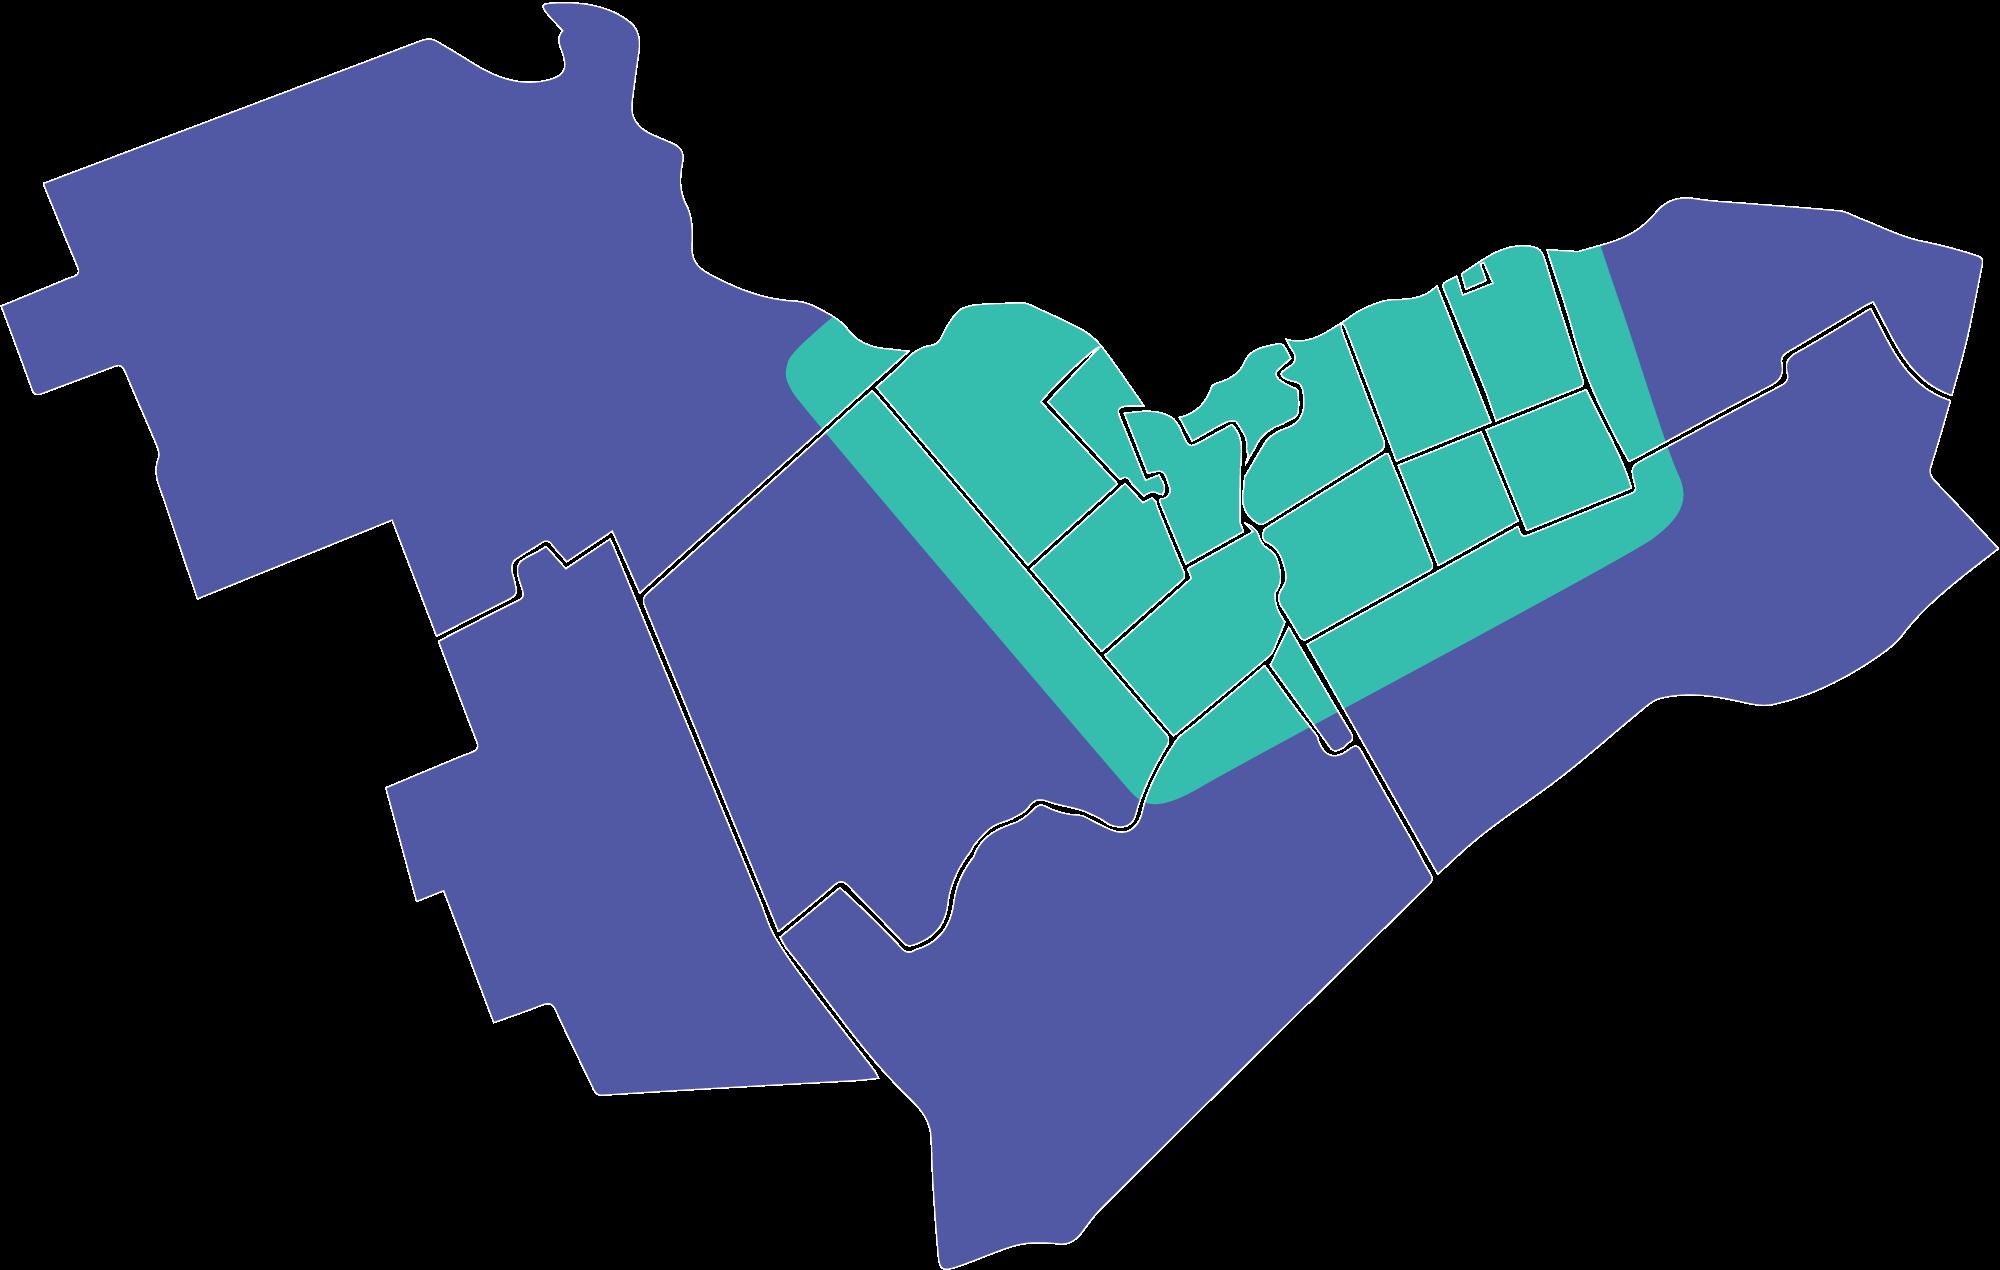 Carte des zones desservies à Ottawa